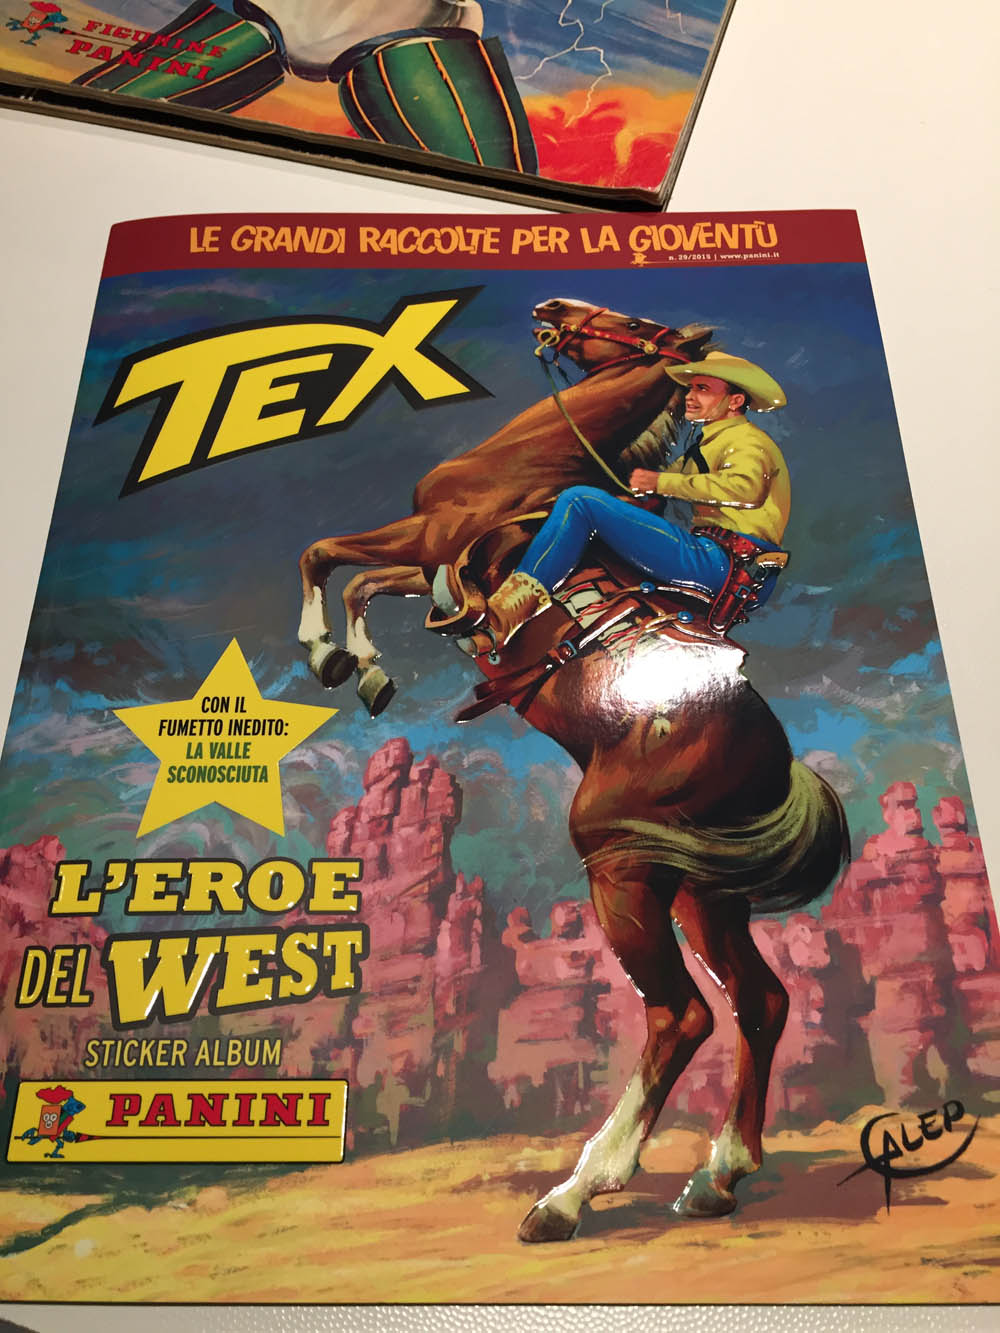 Figurine-stickers n Panini 2015 44 -New TEX L/'EROE DEL WEST